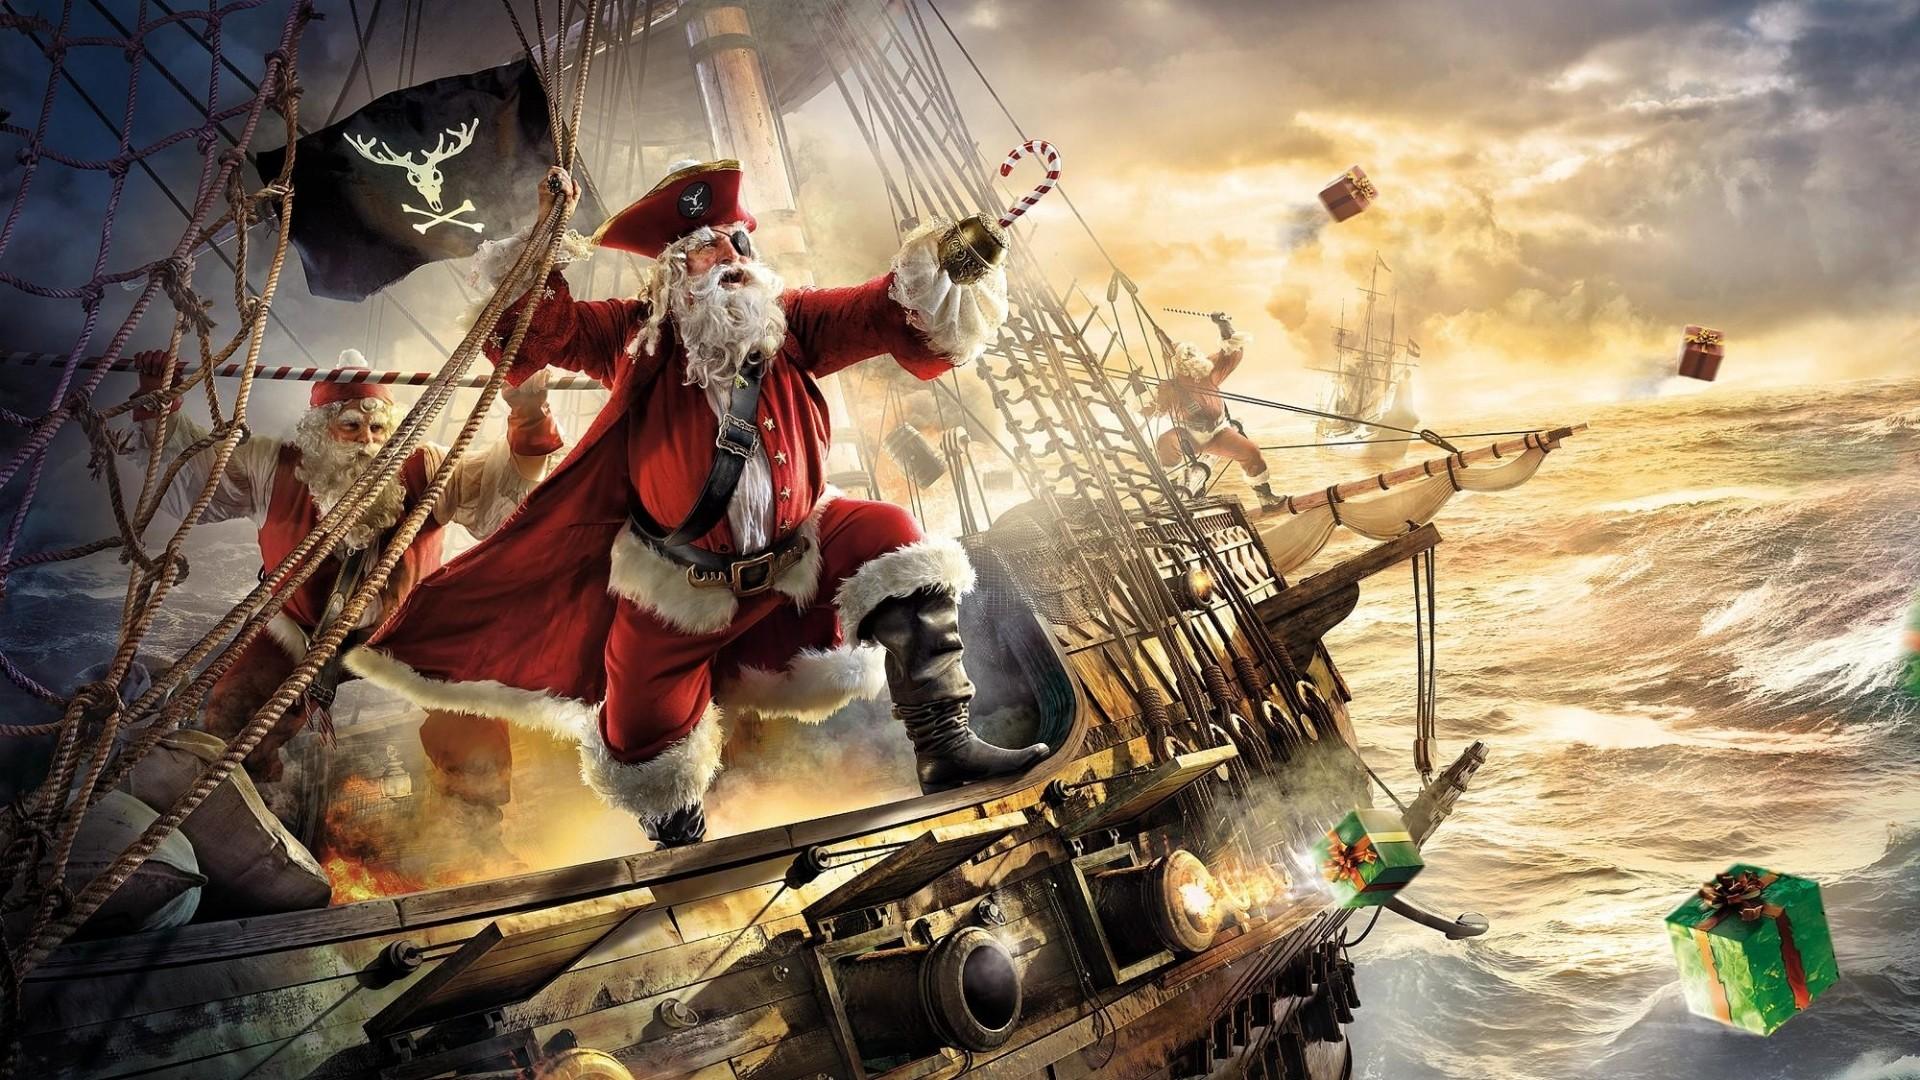 Preview wallpaper santa claus, pirate, ship, gifts, sea, storm 1920×1080